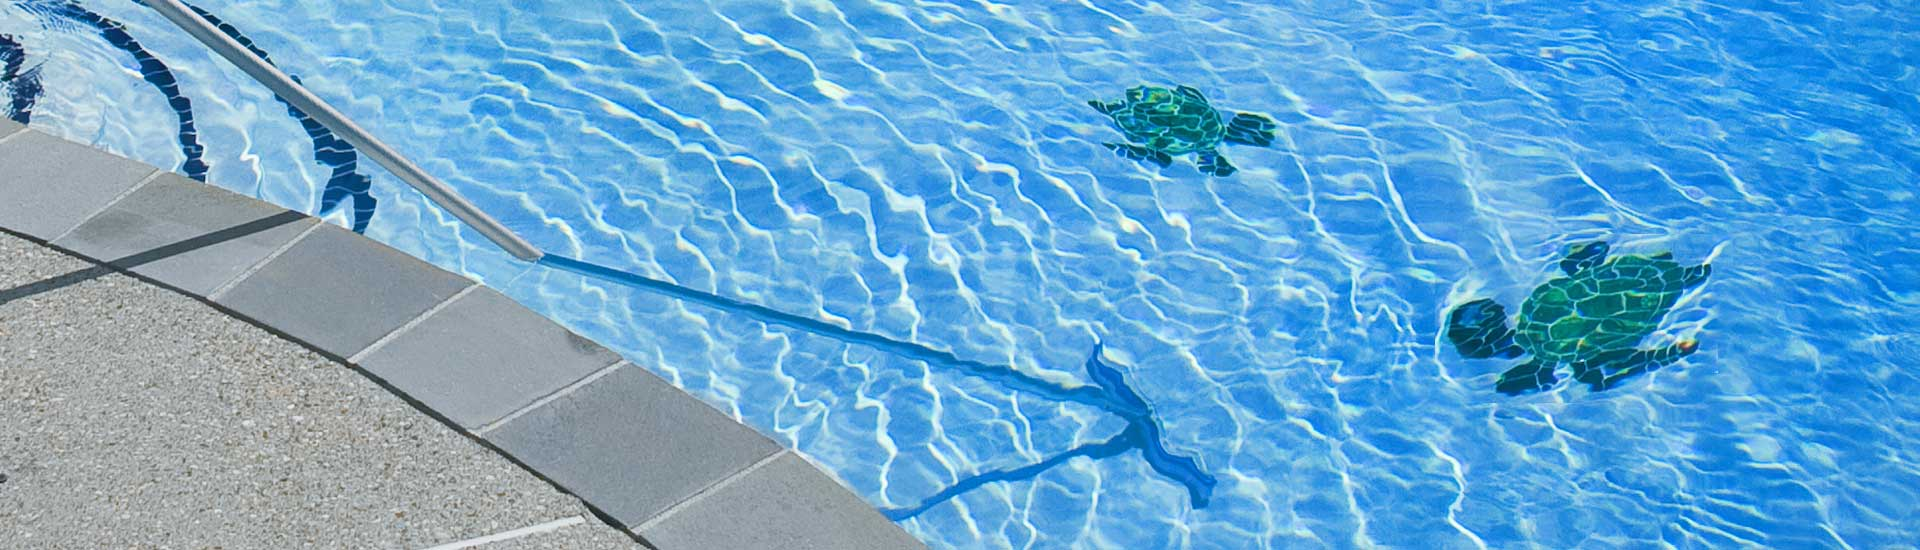 elata-swimming-pool-service-pool-maintenance